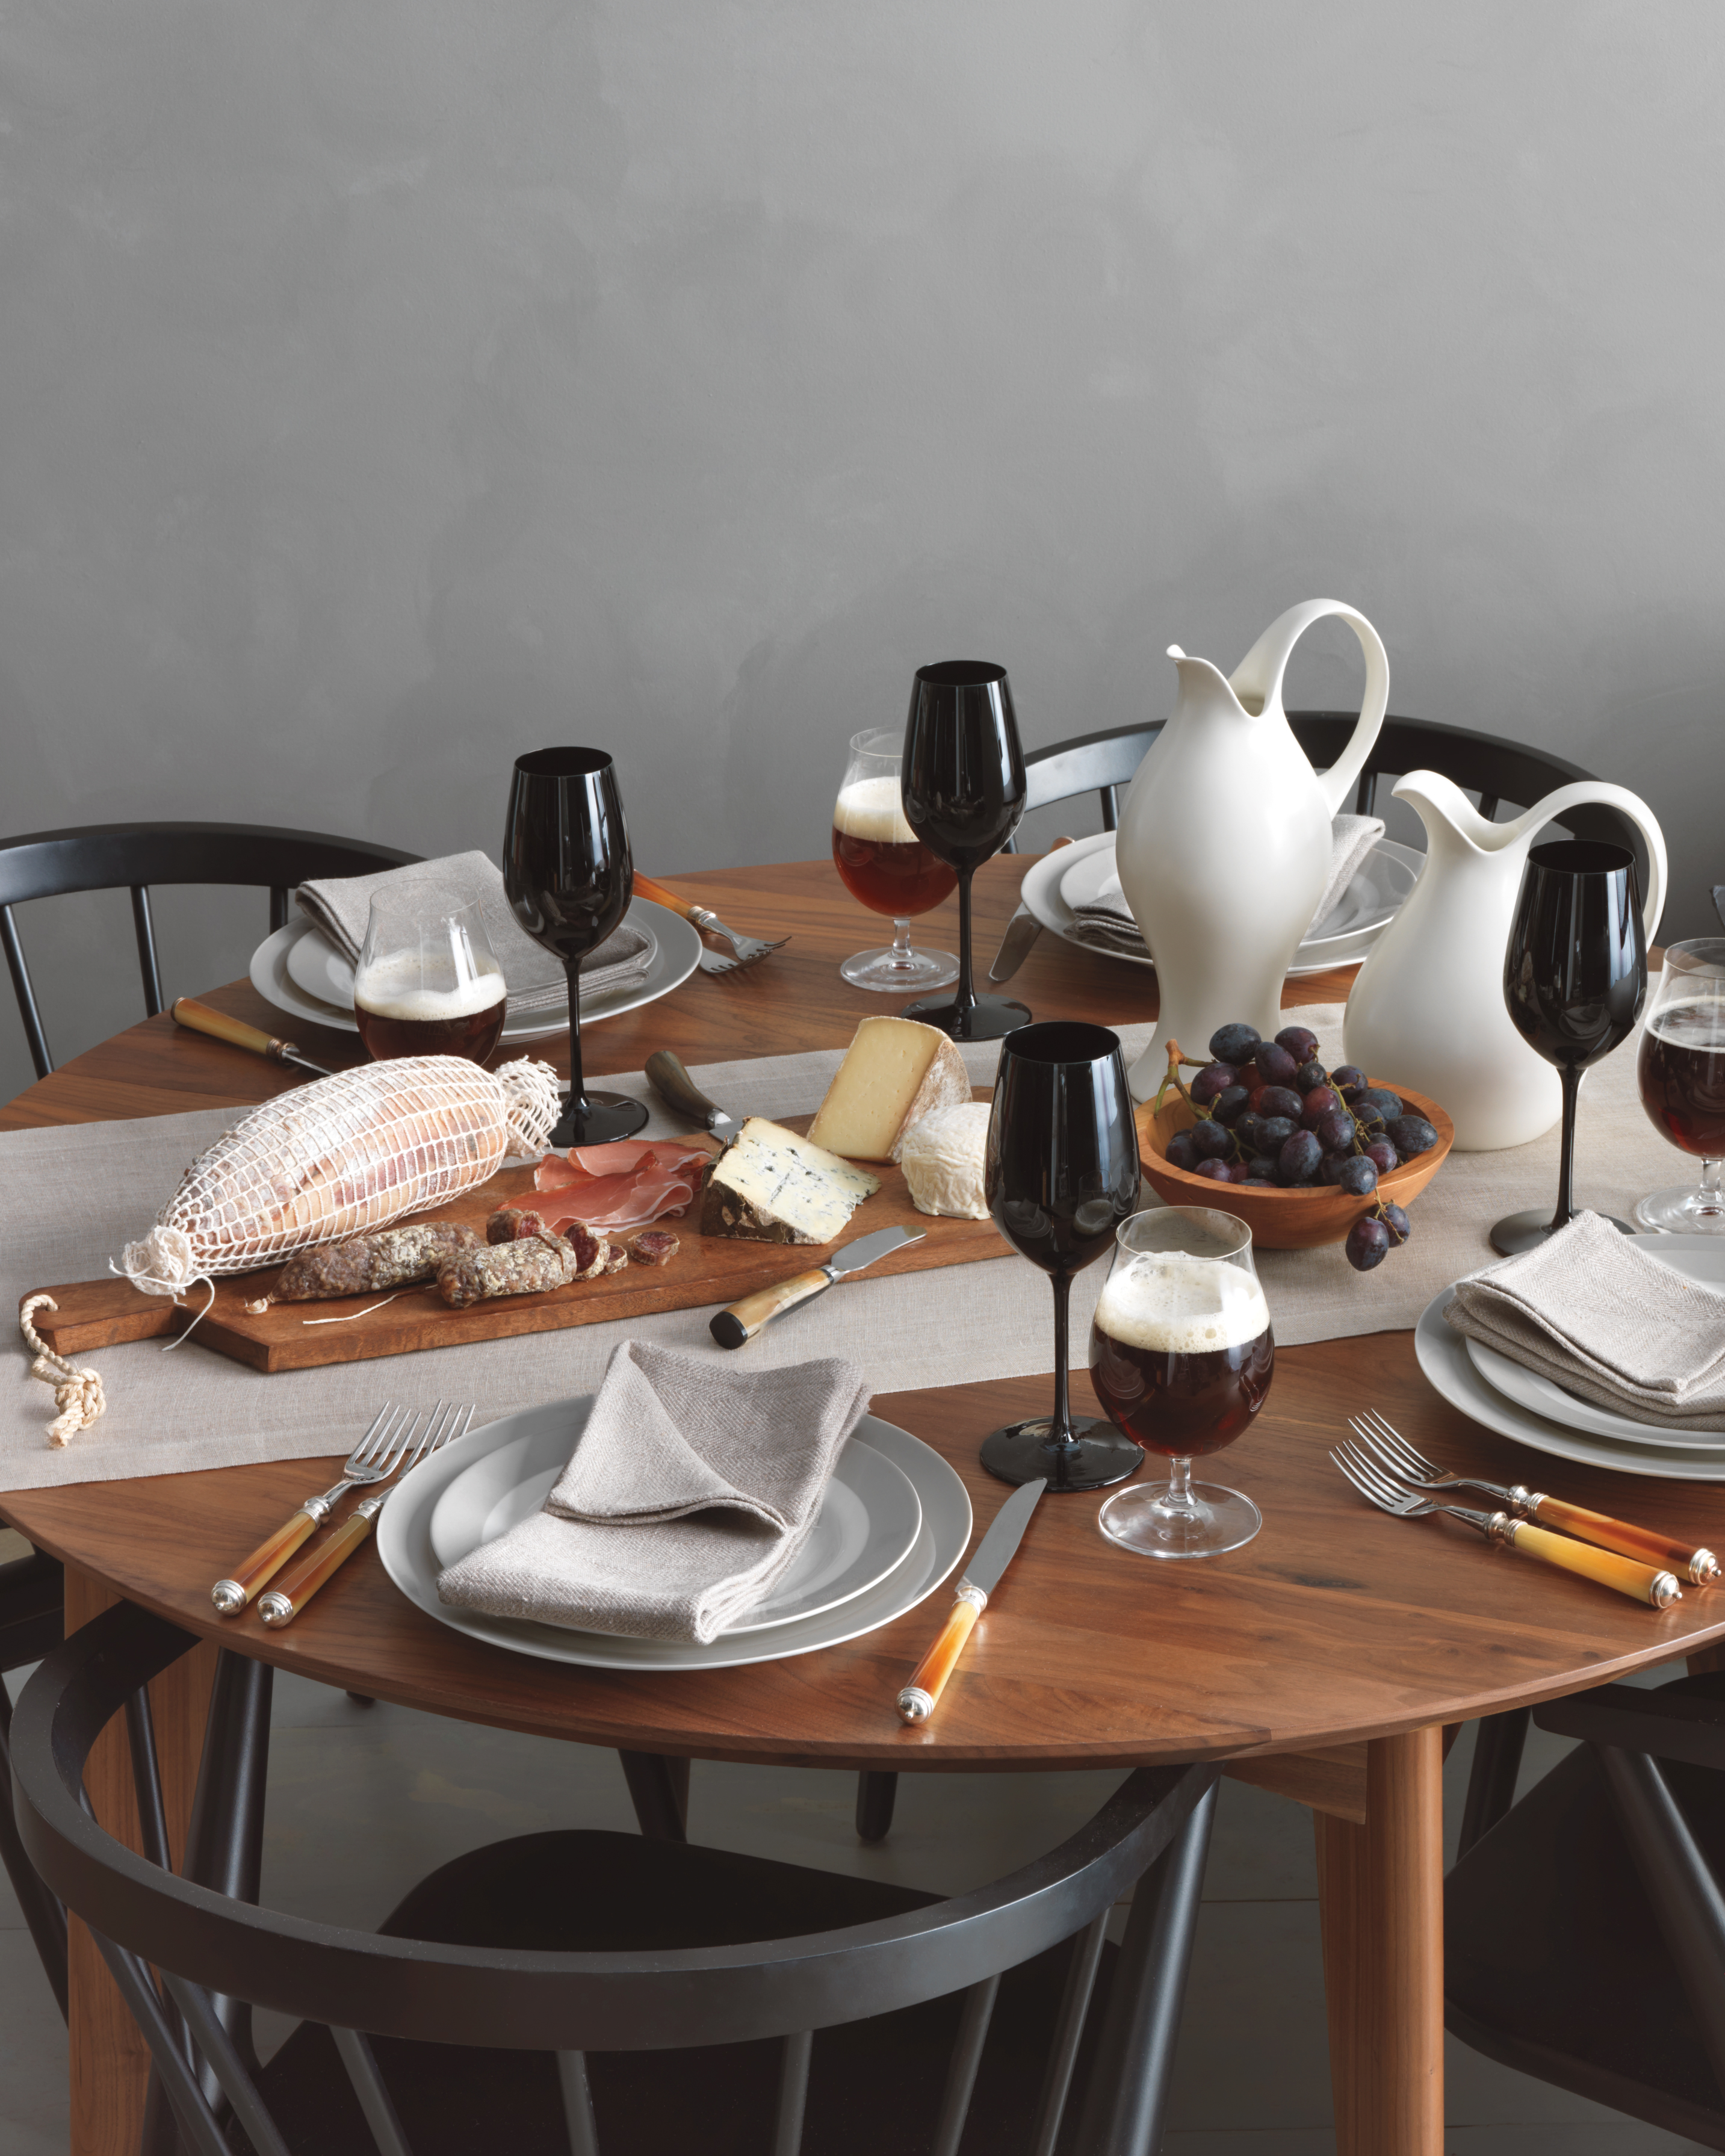 neutral-table-060-comp-mwd109608.jpg